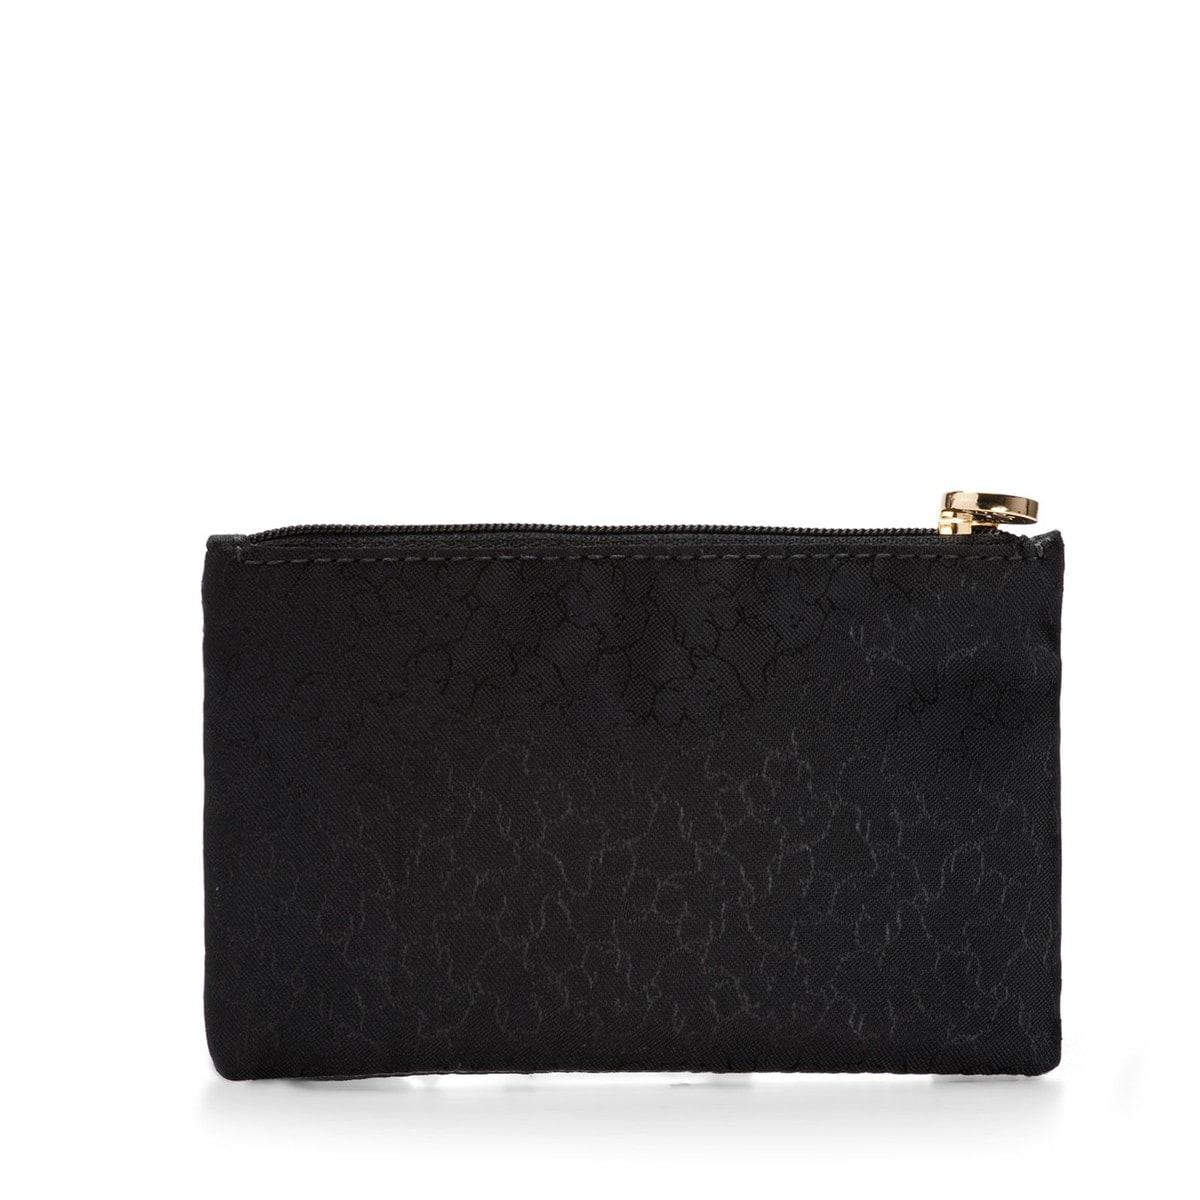 Small black Nylon Clasica Toiletry bag